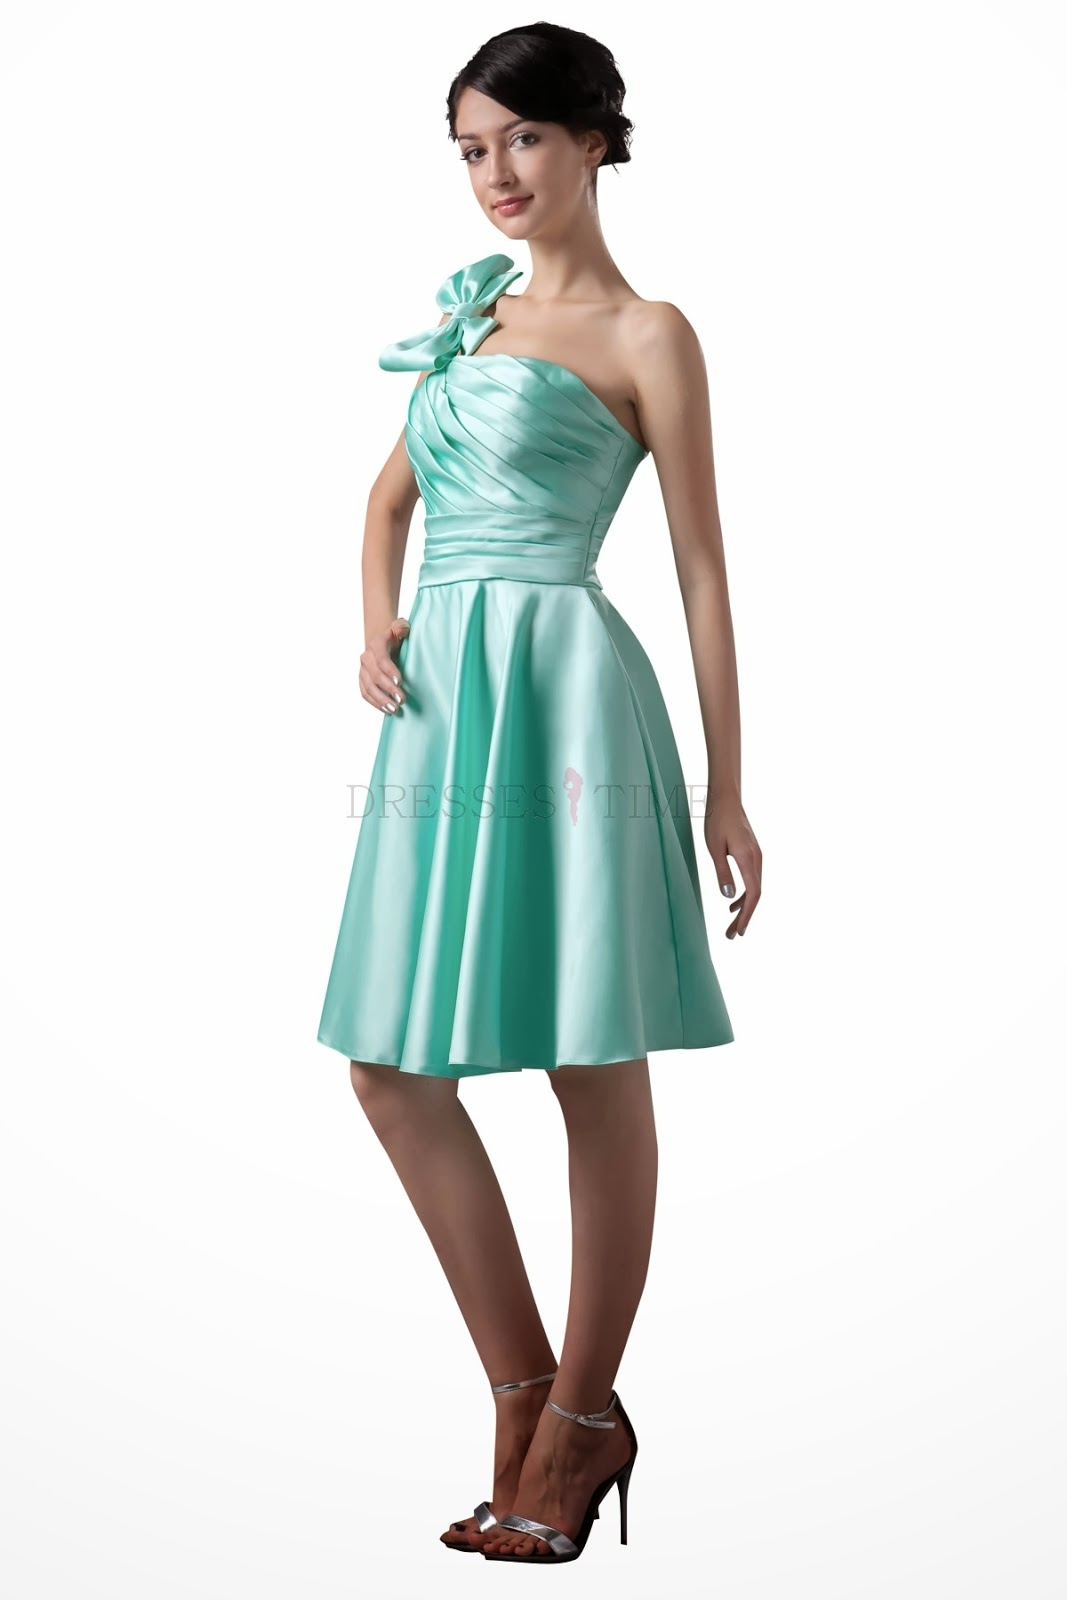 Modelo de vestidos sport elegante